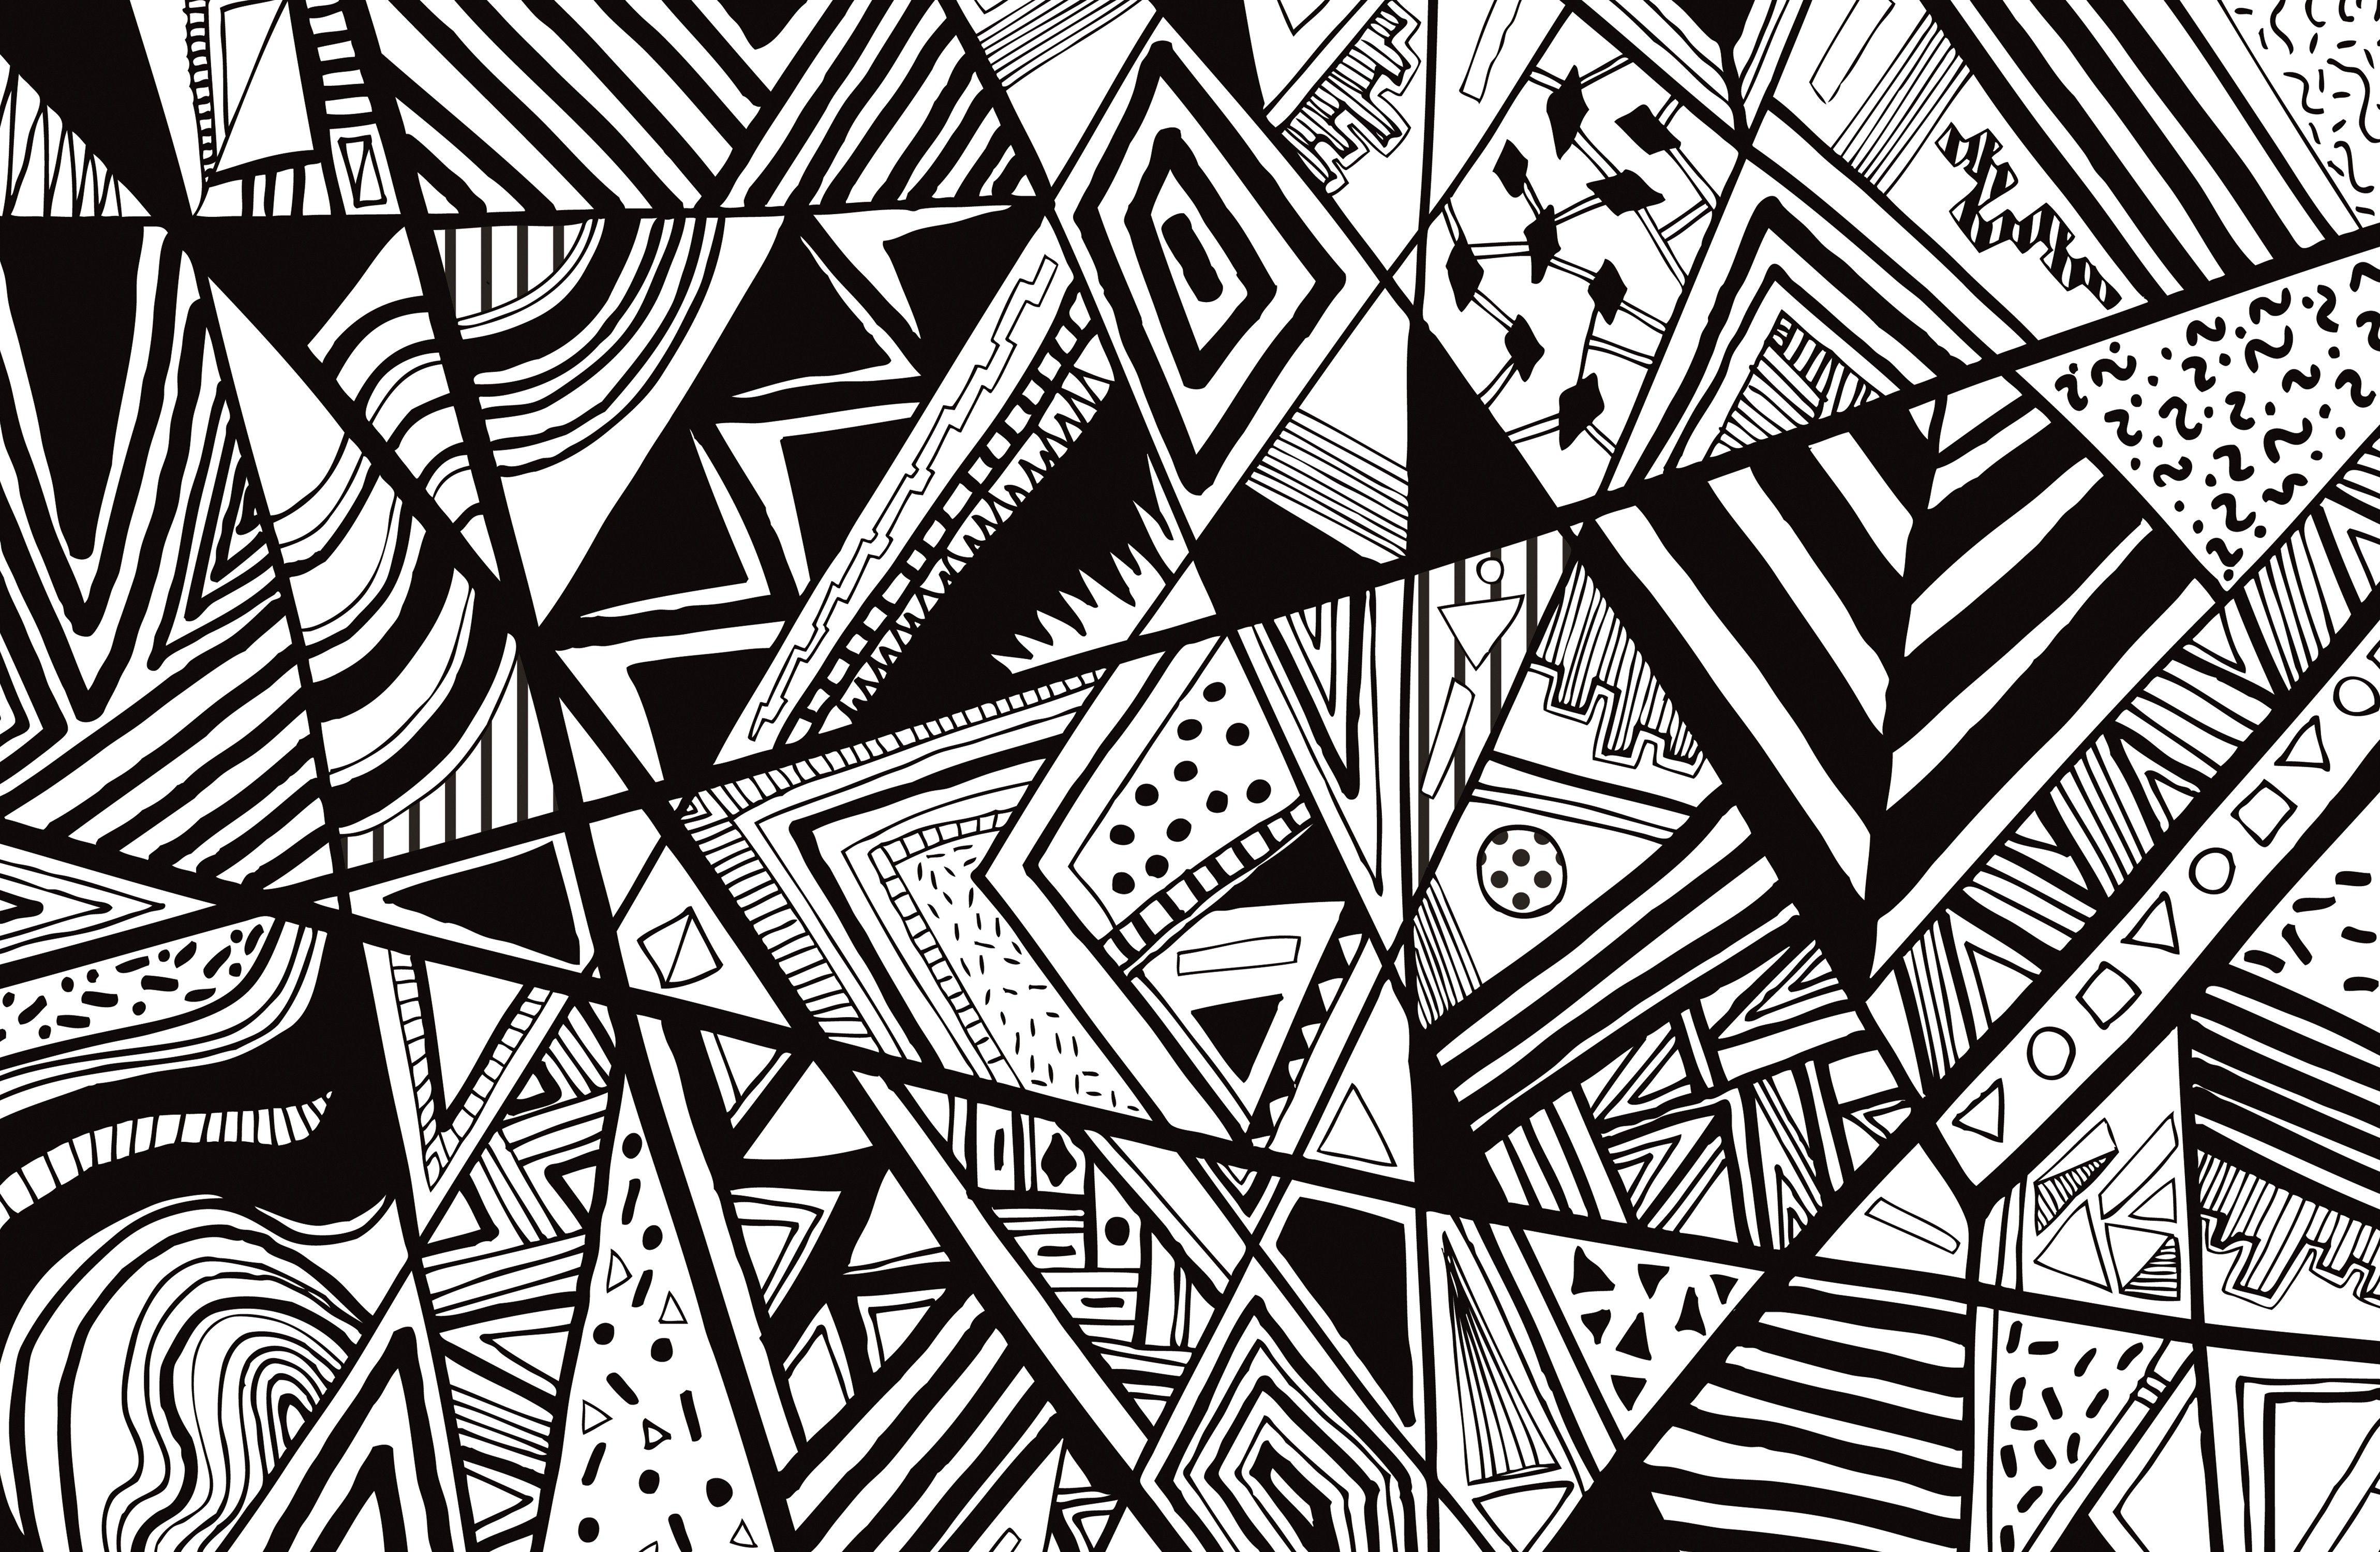 Wallpaper Noir Et Blanc Dessin Gallery Avec Fond Ecran